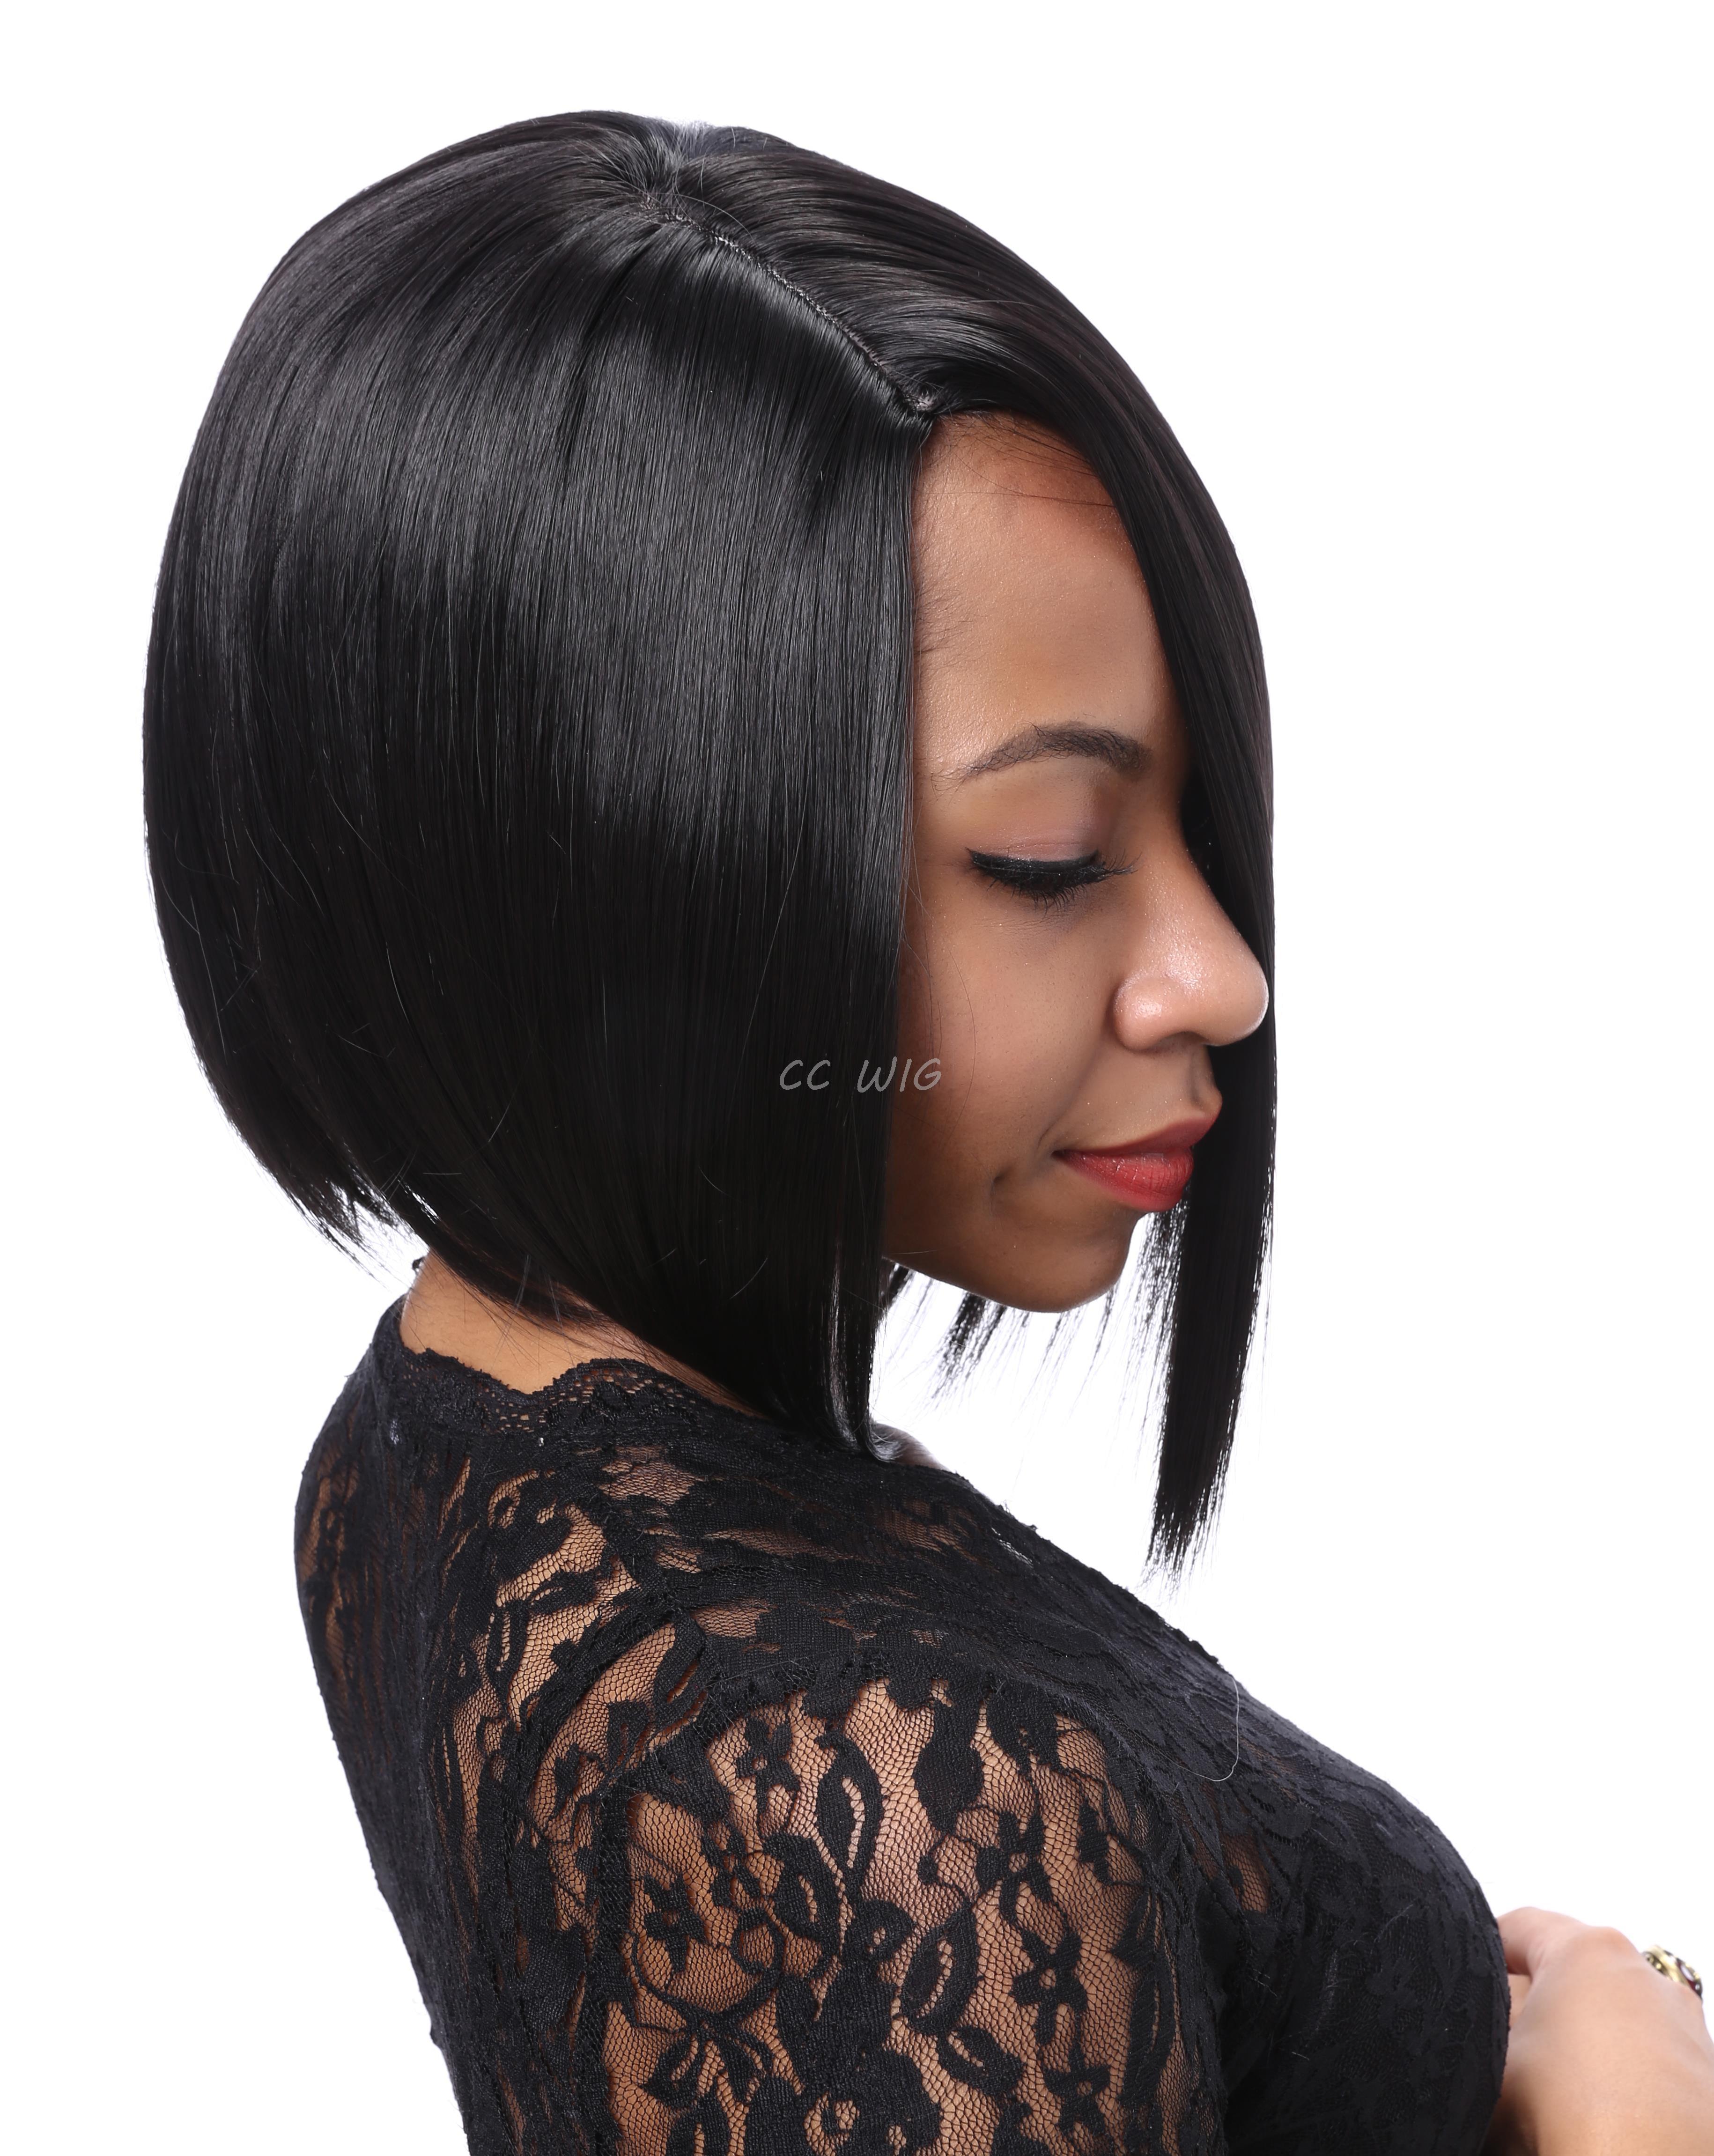 Short Black Bob Hairstyles Wig High Quality Wigs For Black Women